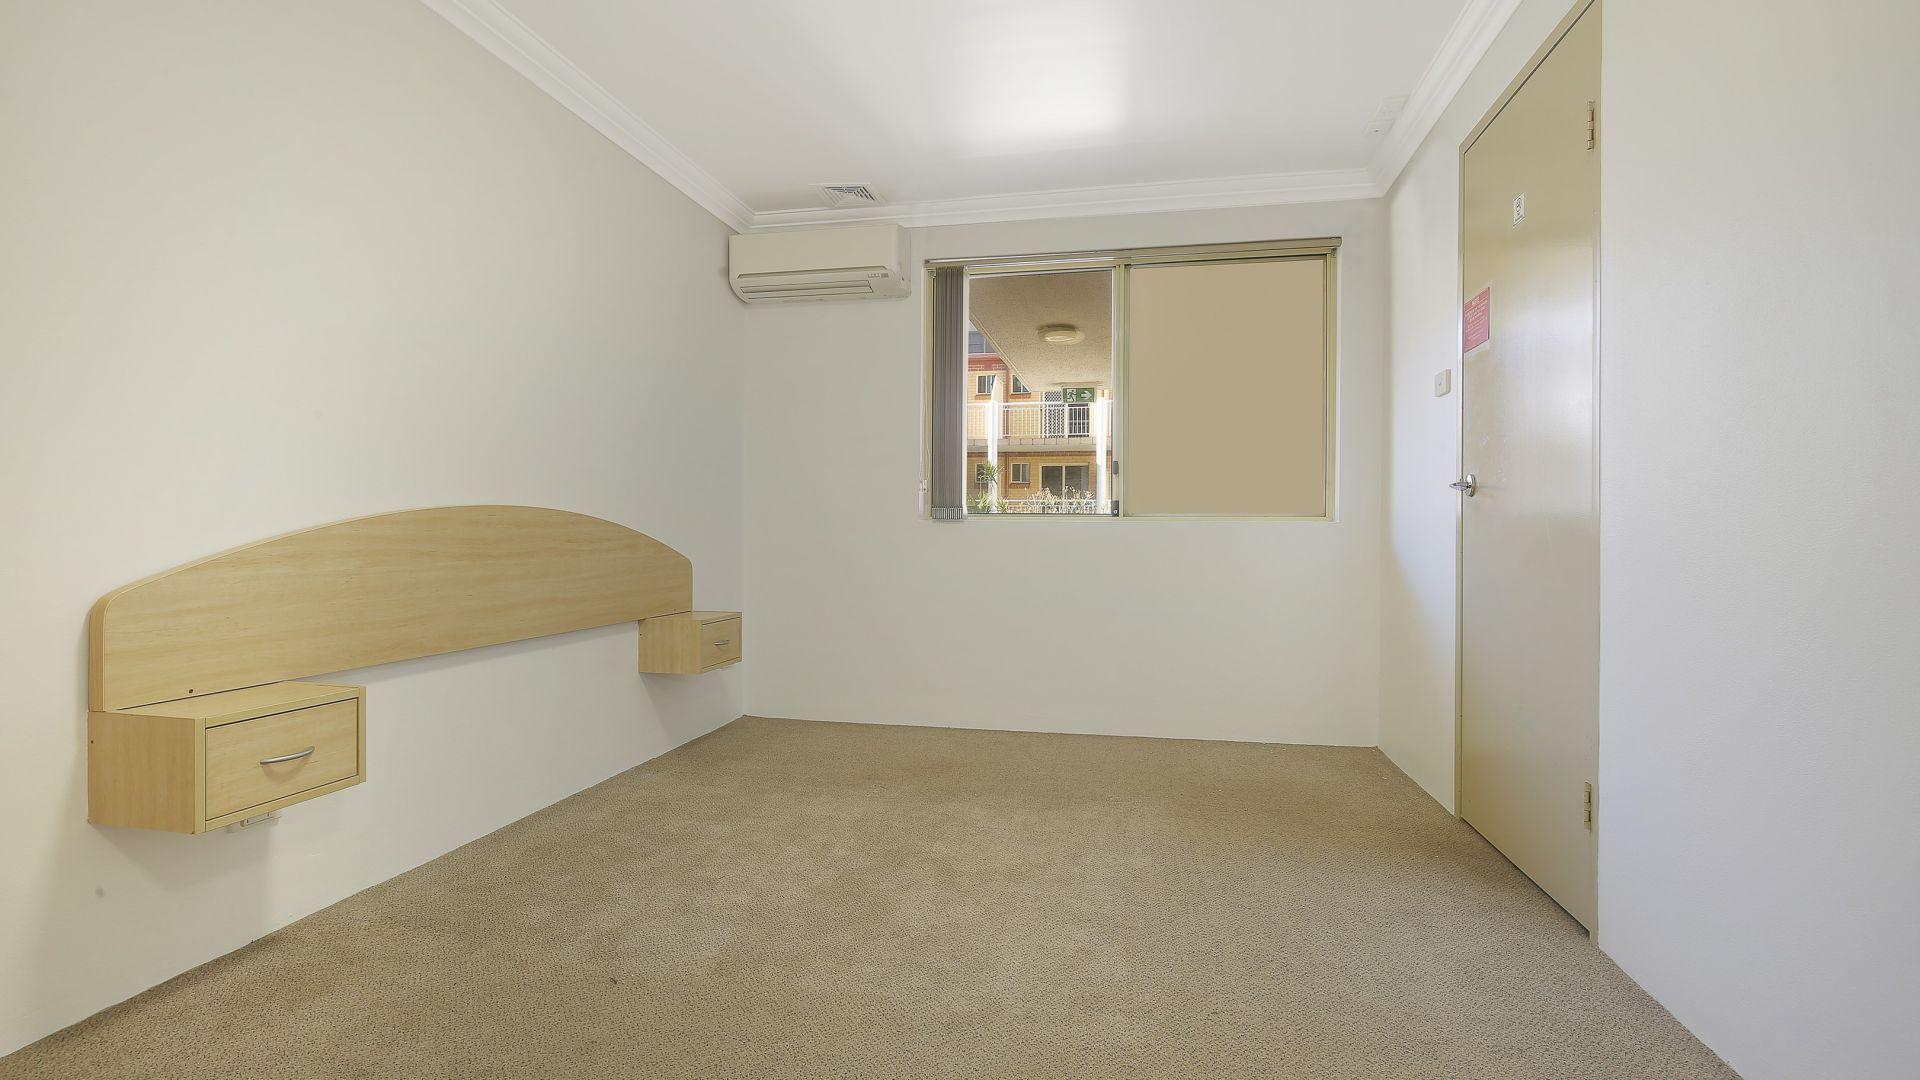 75-79 Keira Street, Wollongong NSW 2500, Image 2